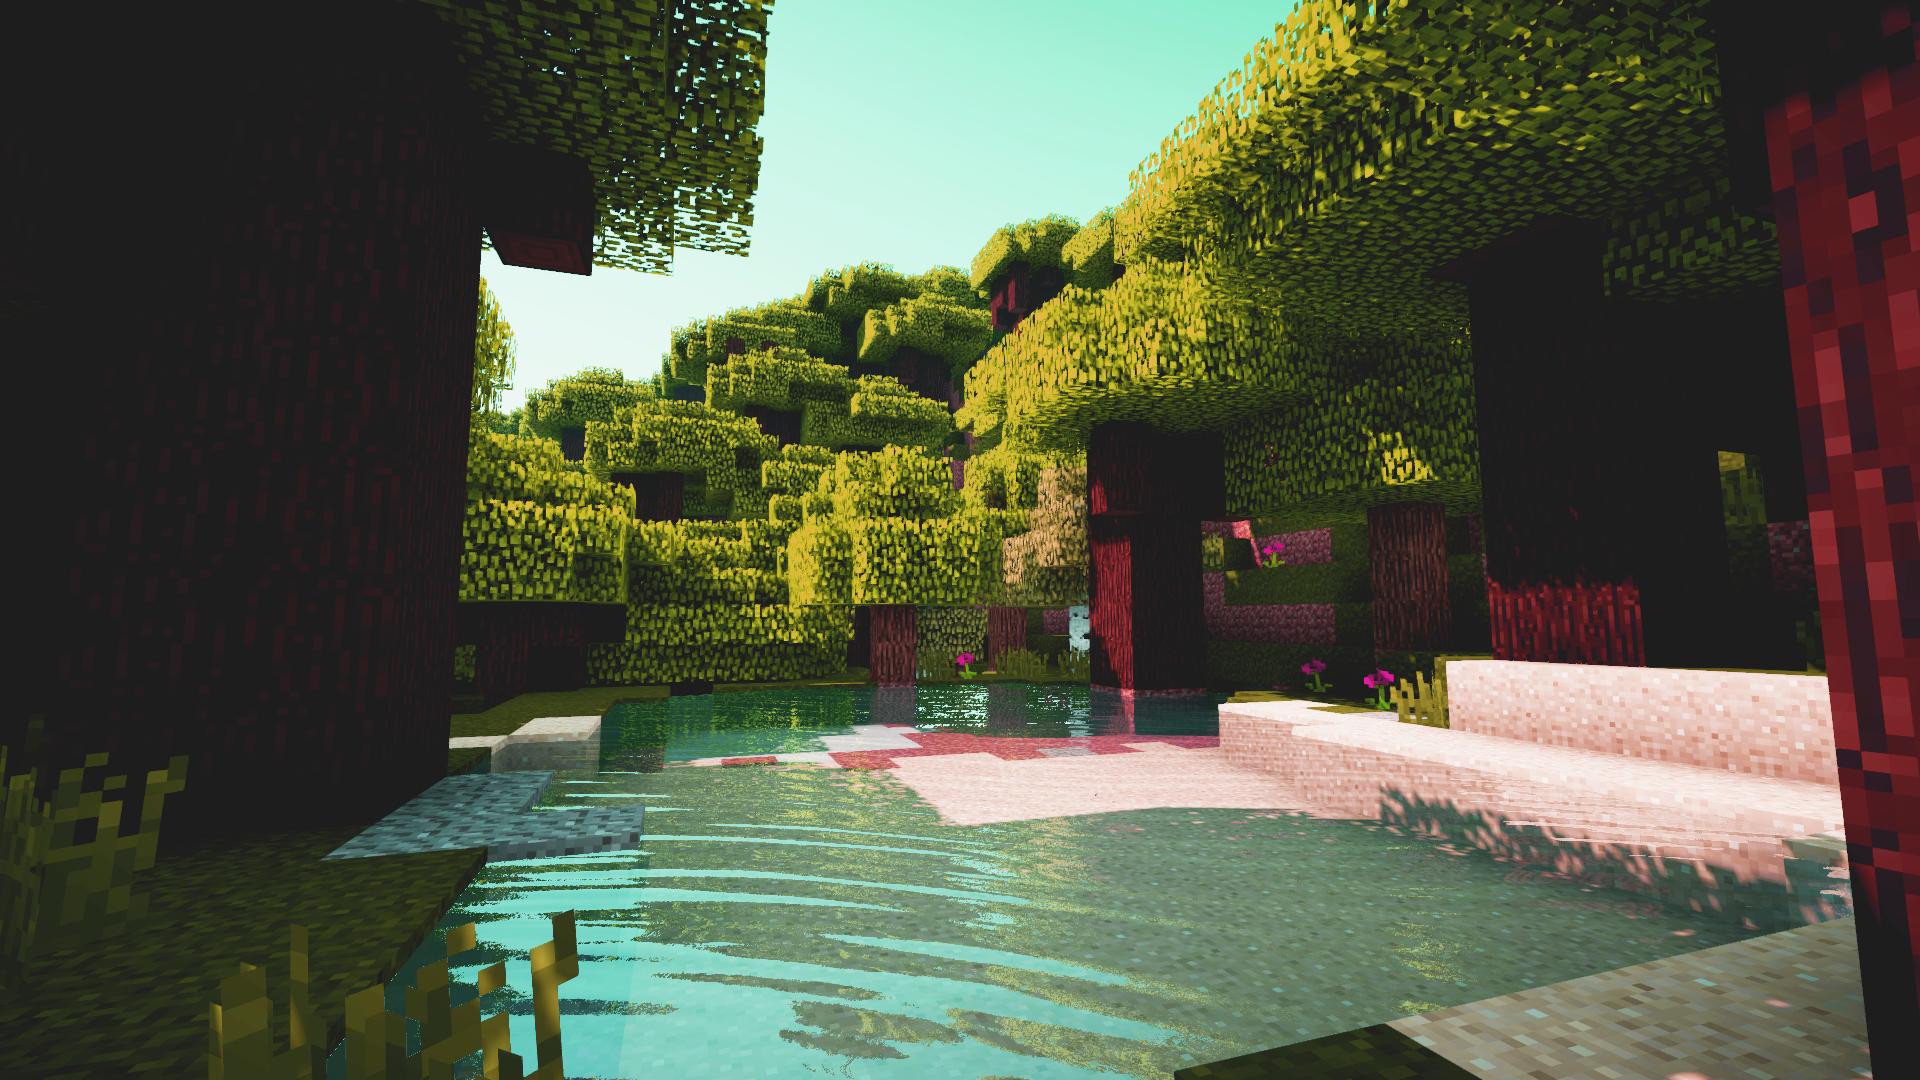 Minecraft Shaders Screenshot Edited 1920x1080